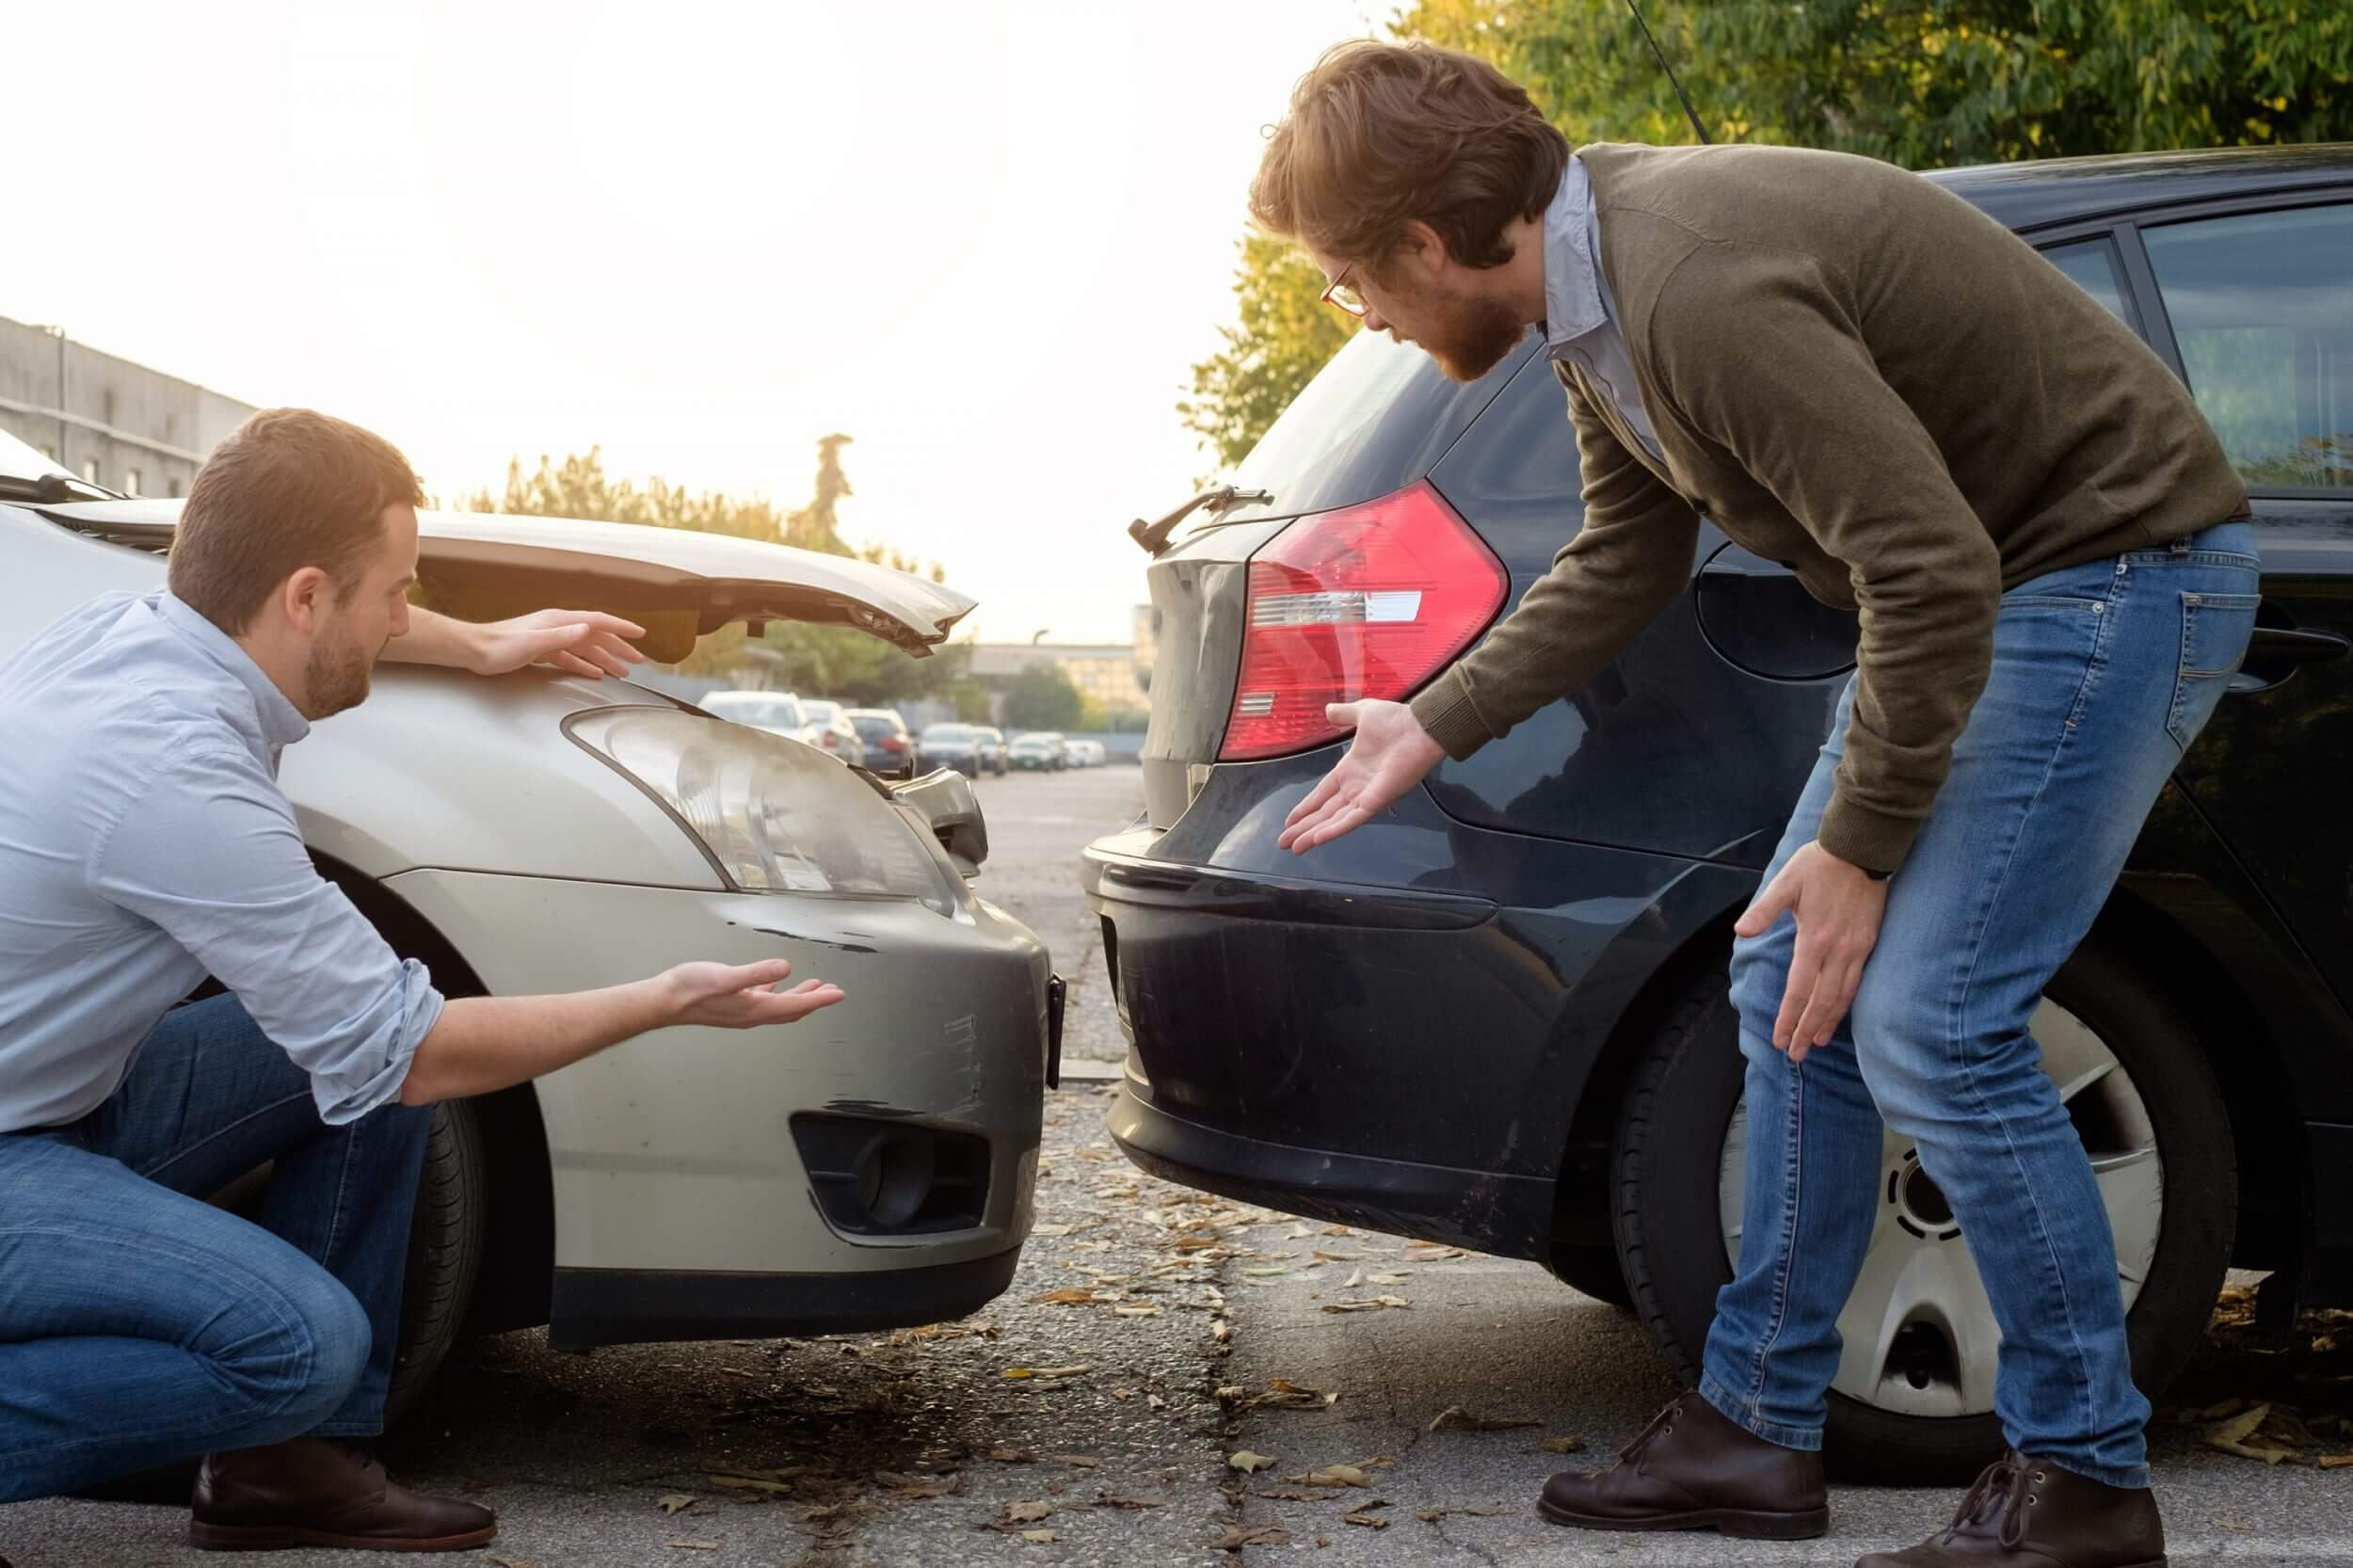 Car accident dispute